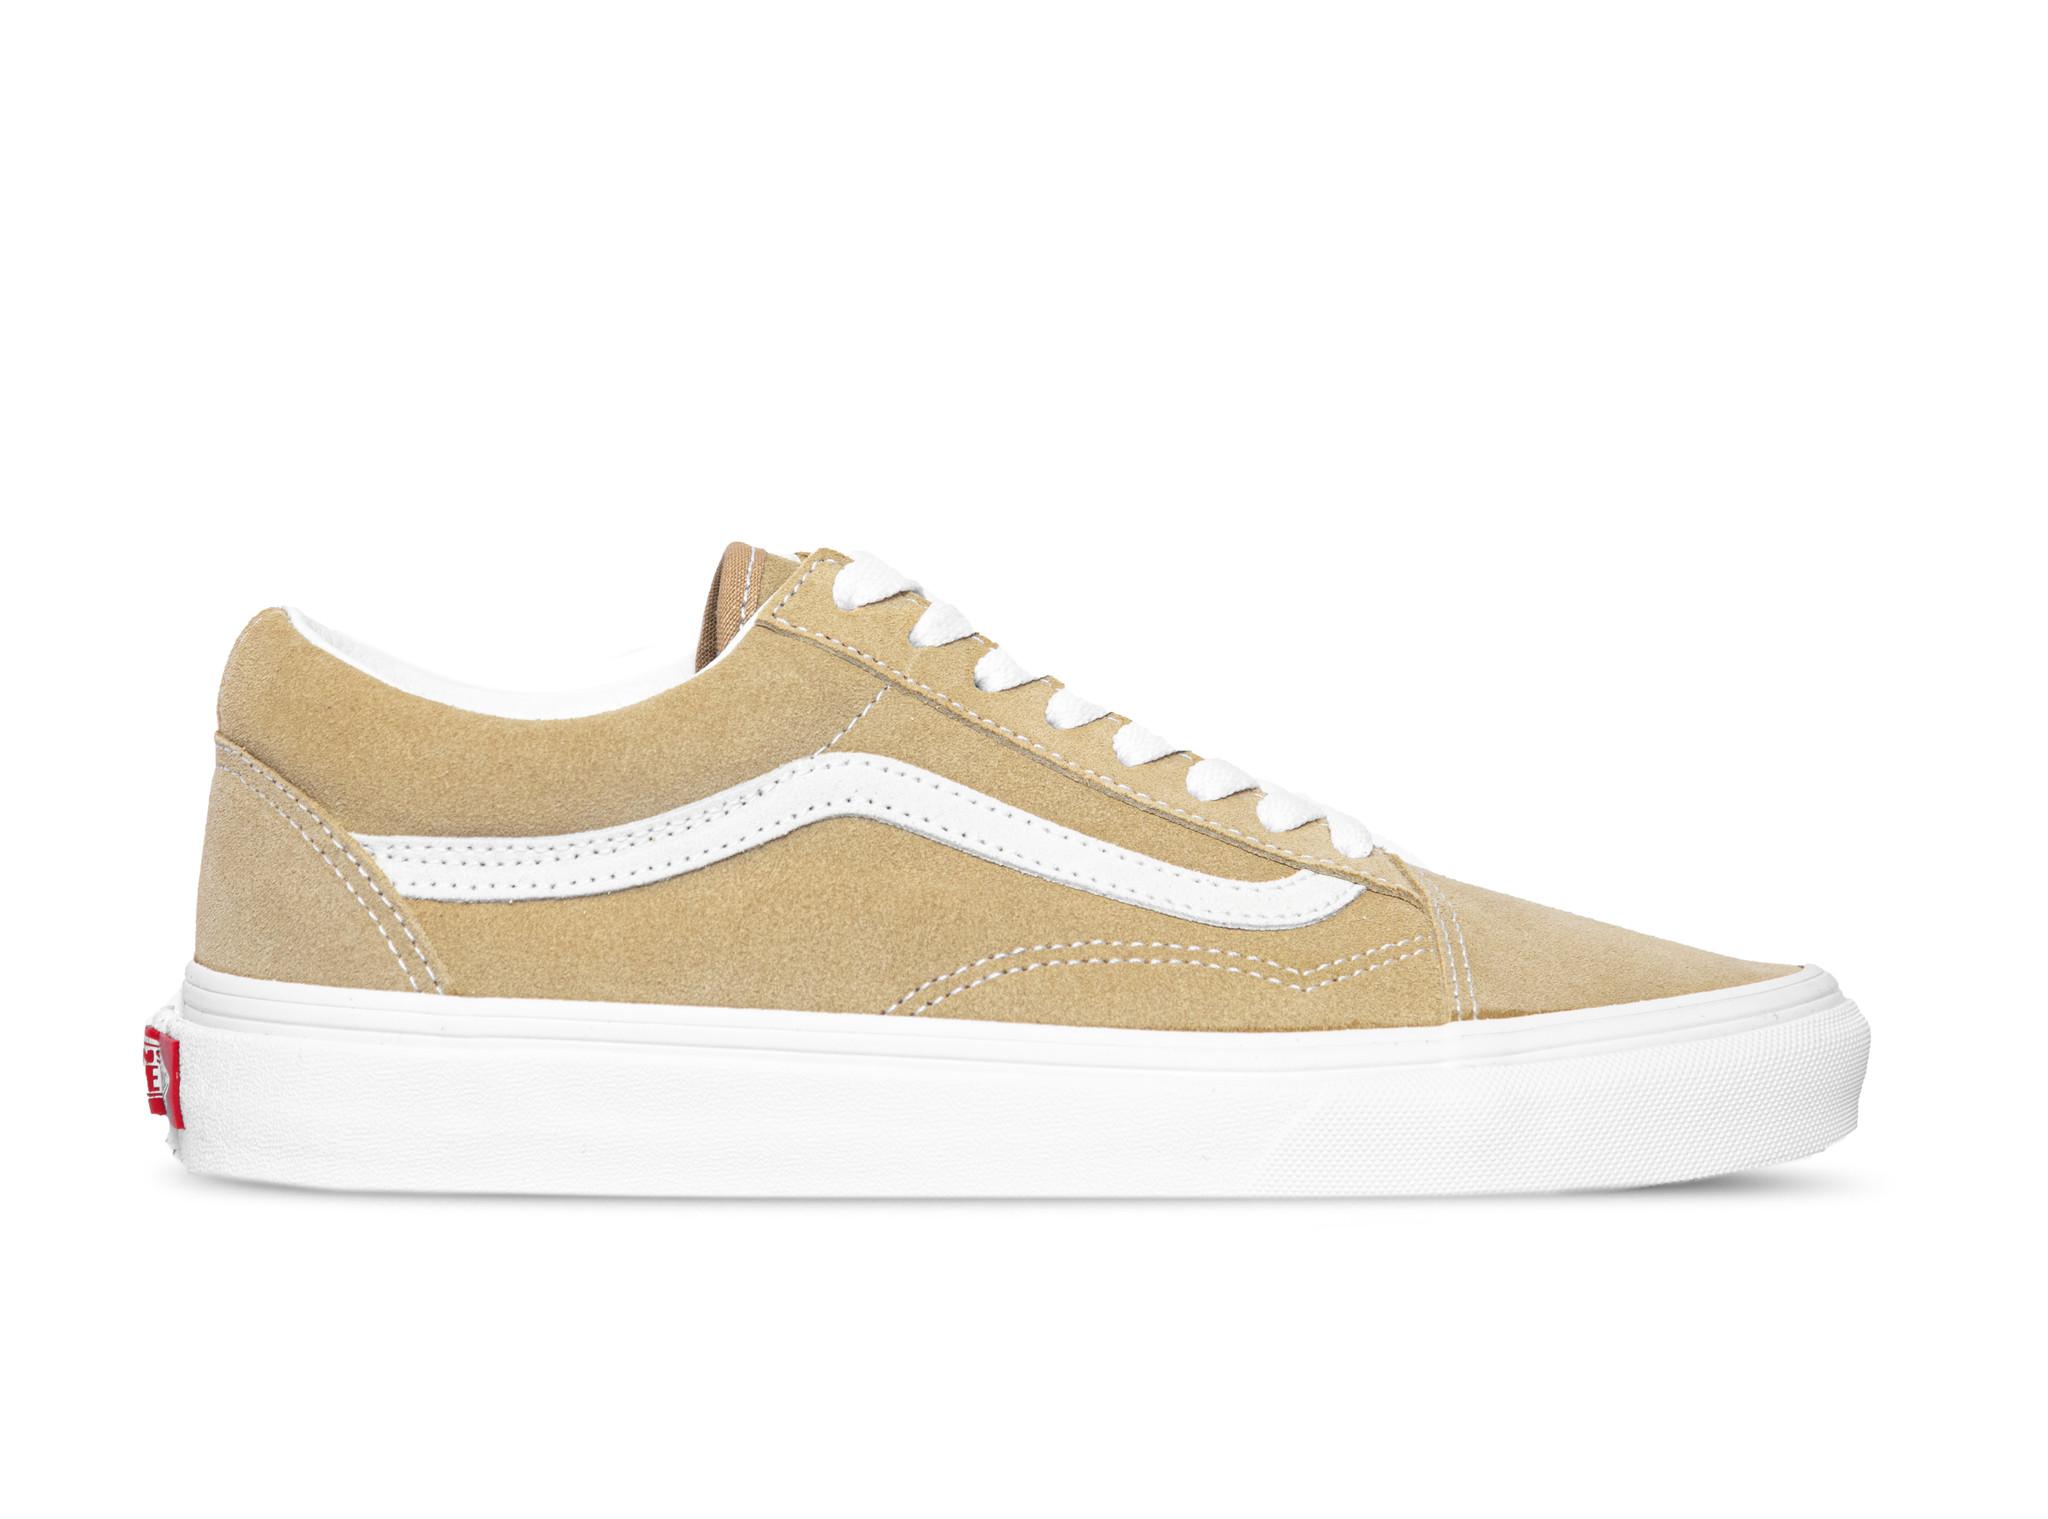 Vans x The North Face Shoes Size 10